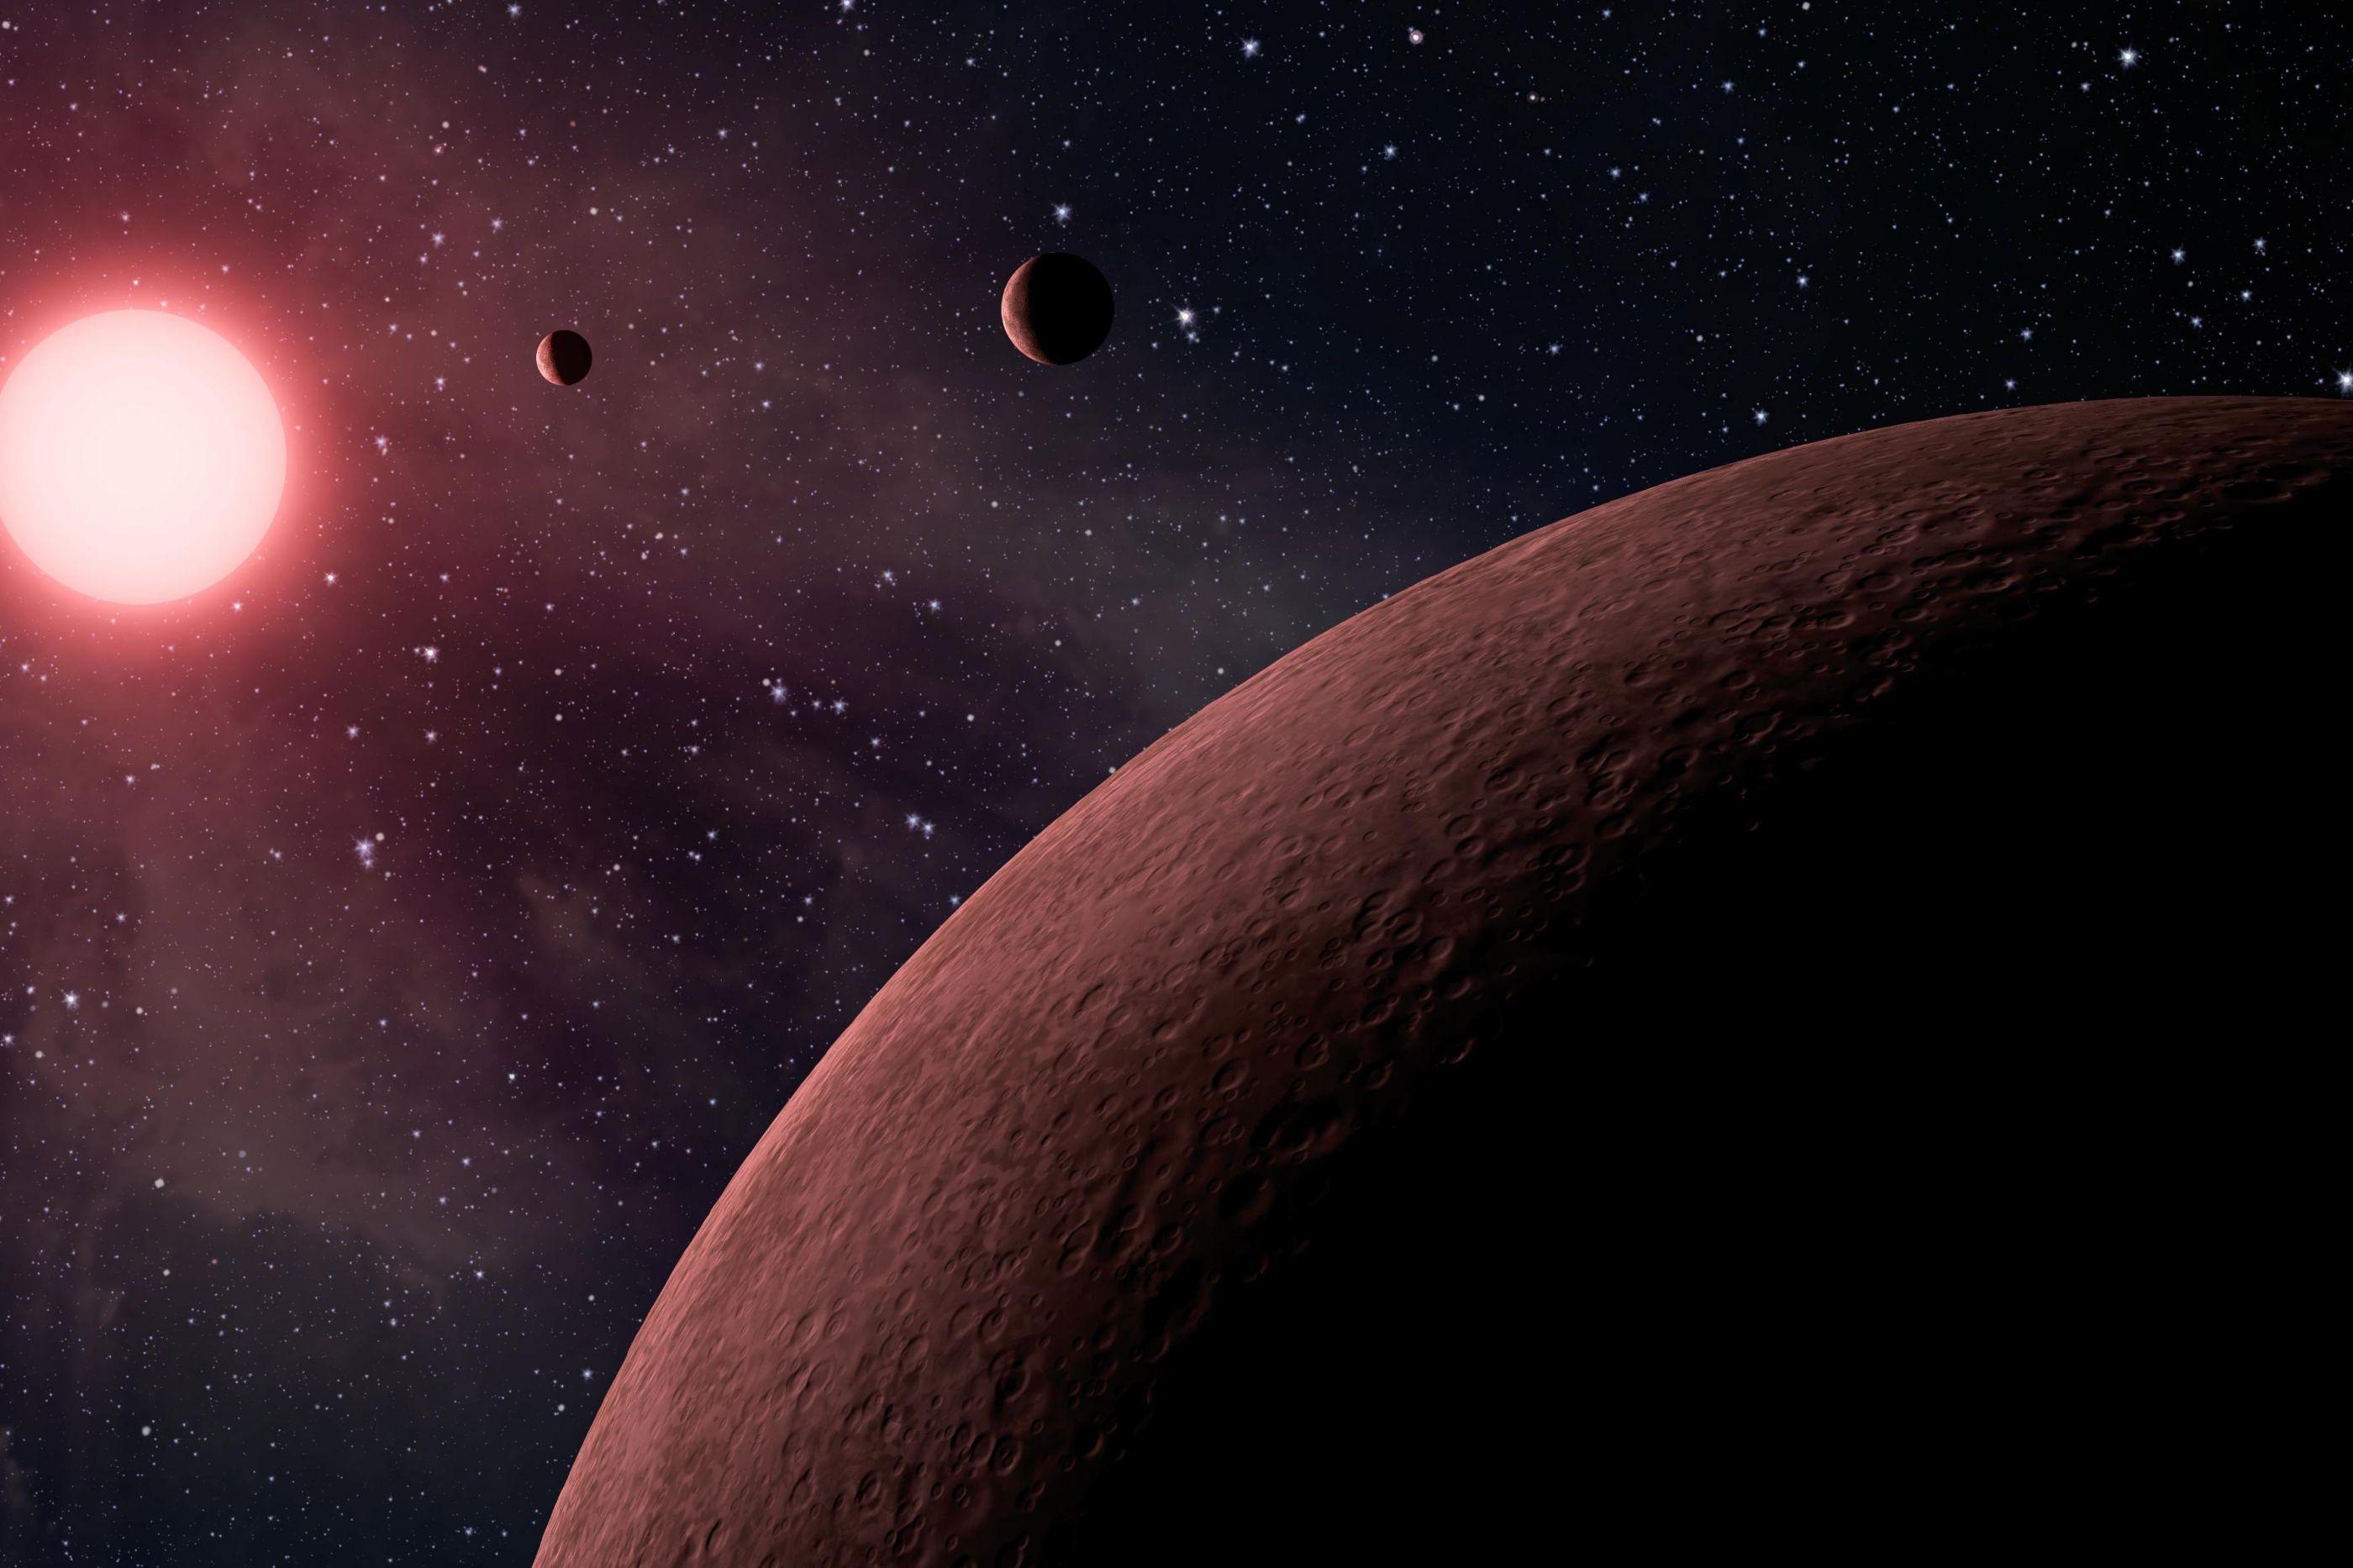 Descoberto planeta fora do Sistema Solar que está mais perto da Terra